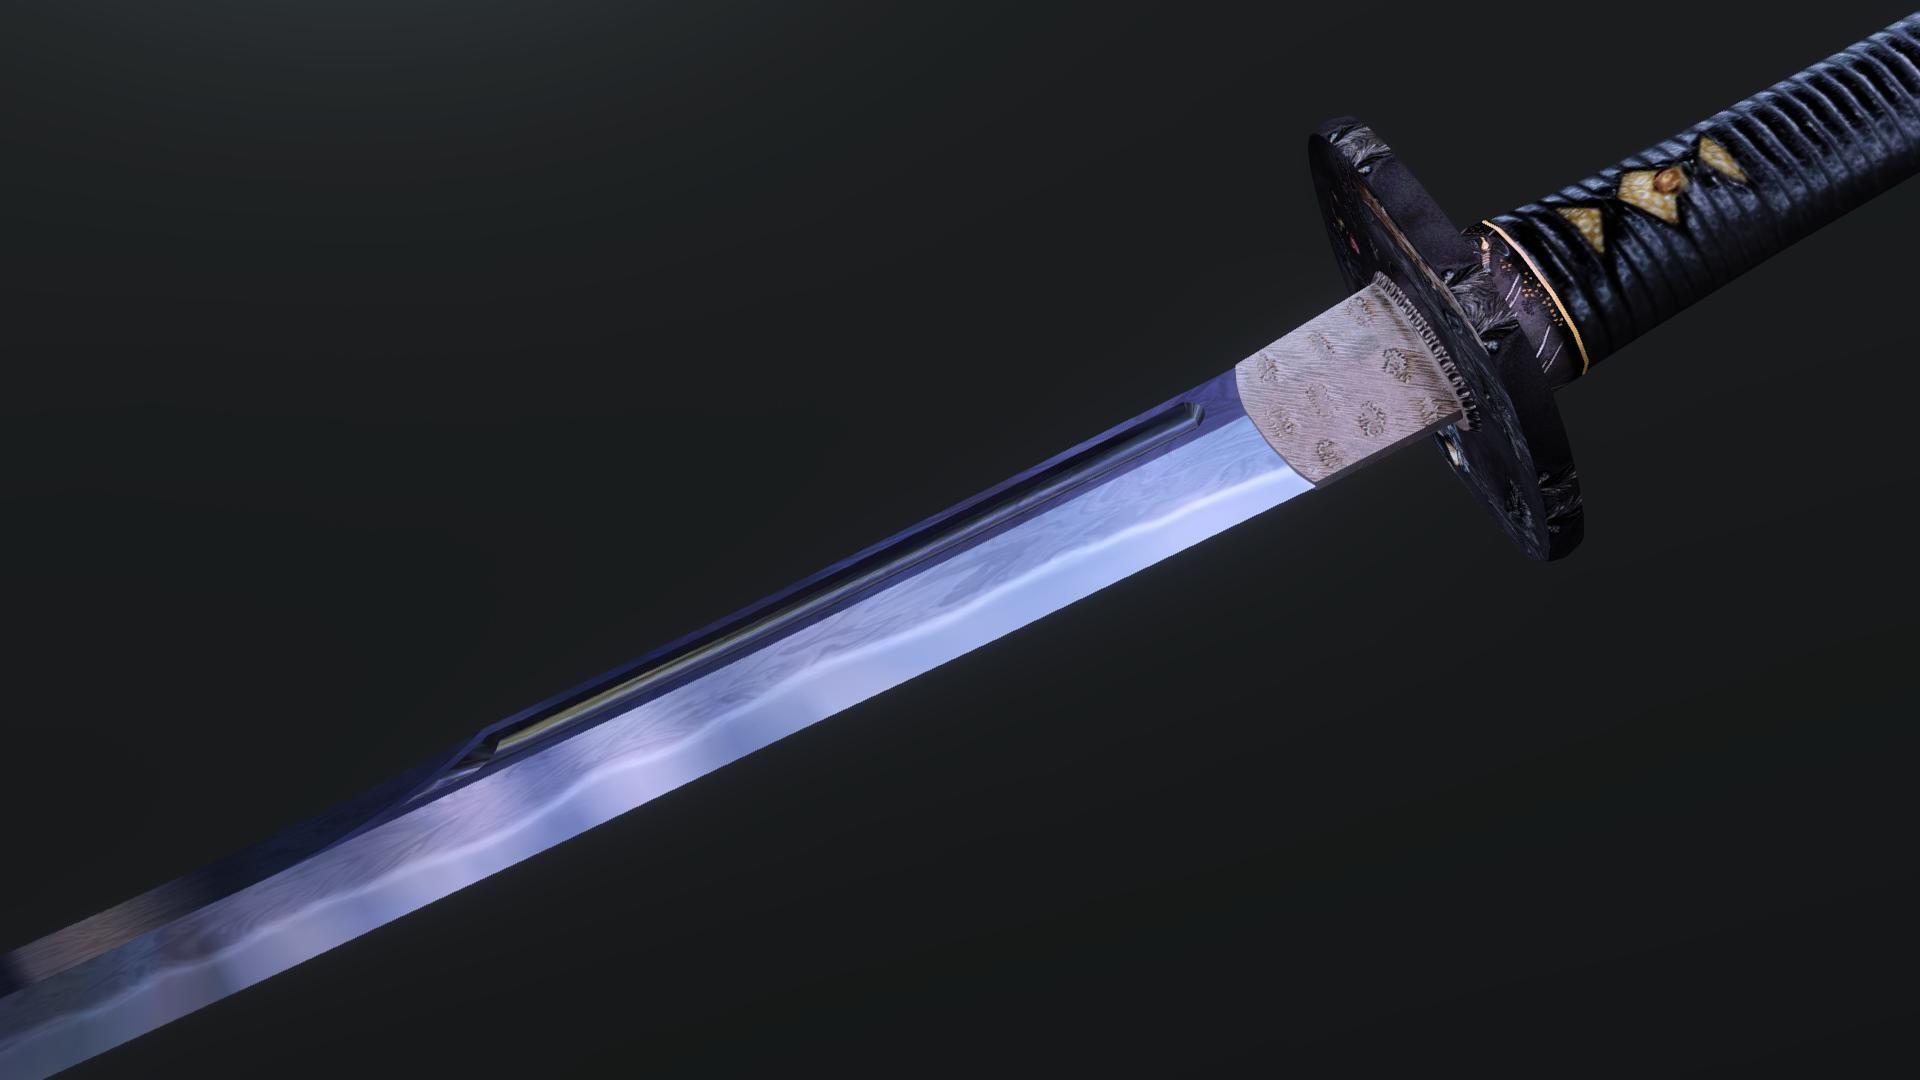 Sword Wallpaper Image